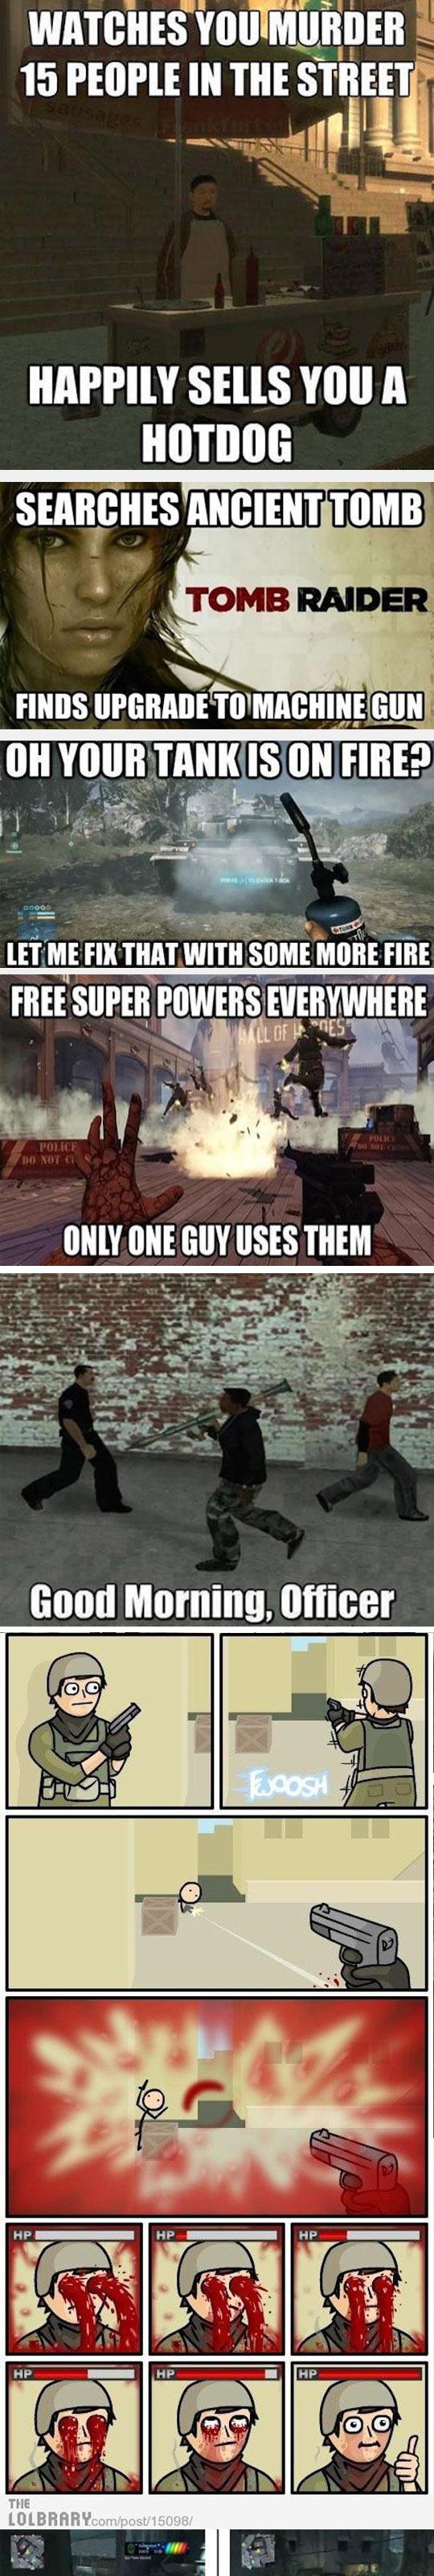 funny-video-game-GTA-logic